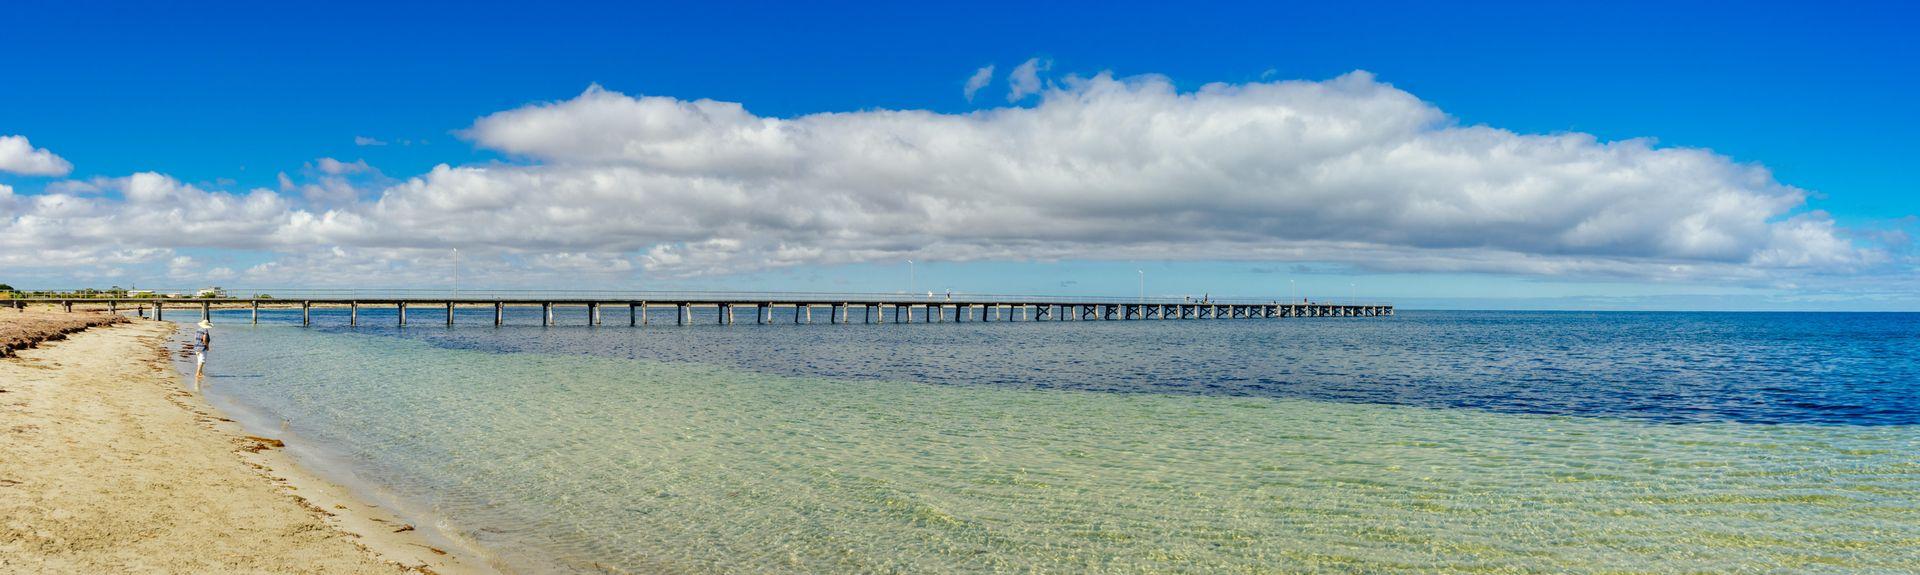 Marion Bay SA, Australia